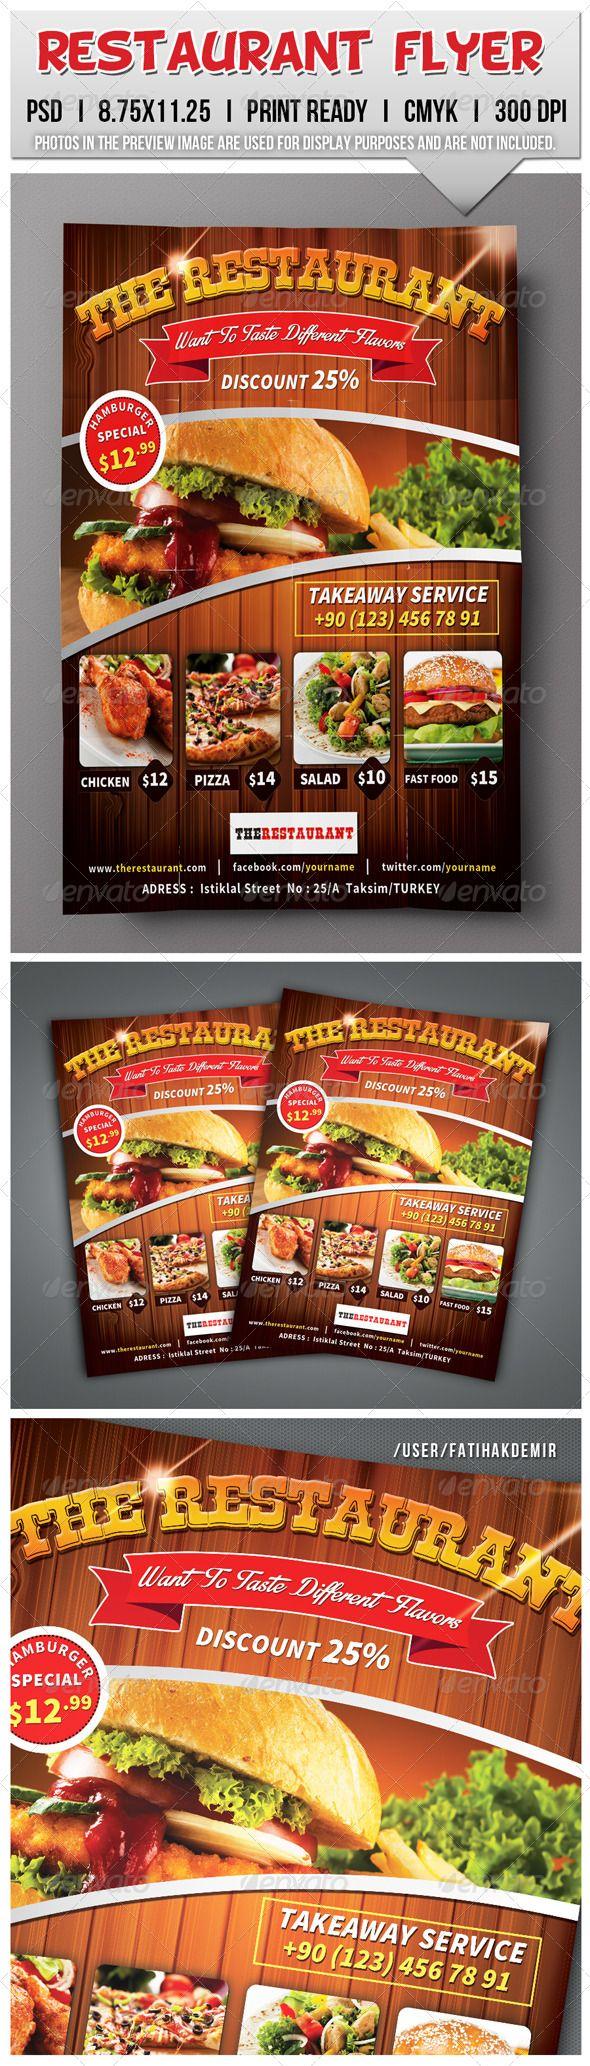 how to change font in hamburger menu wix